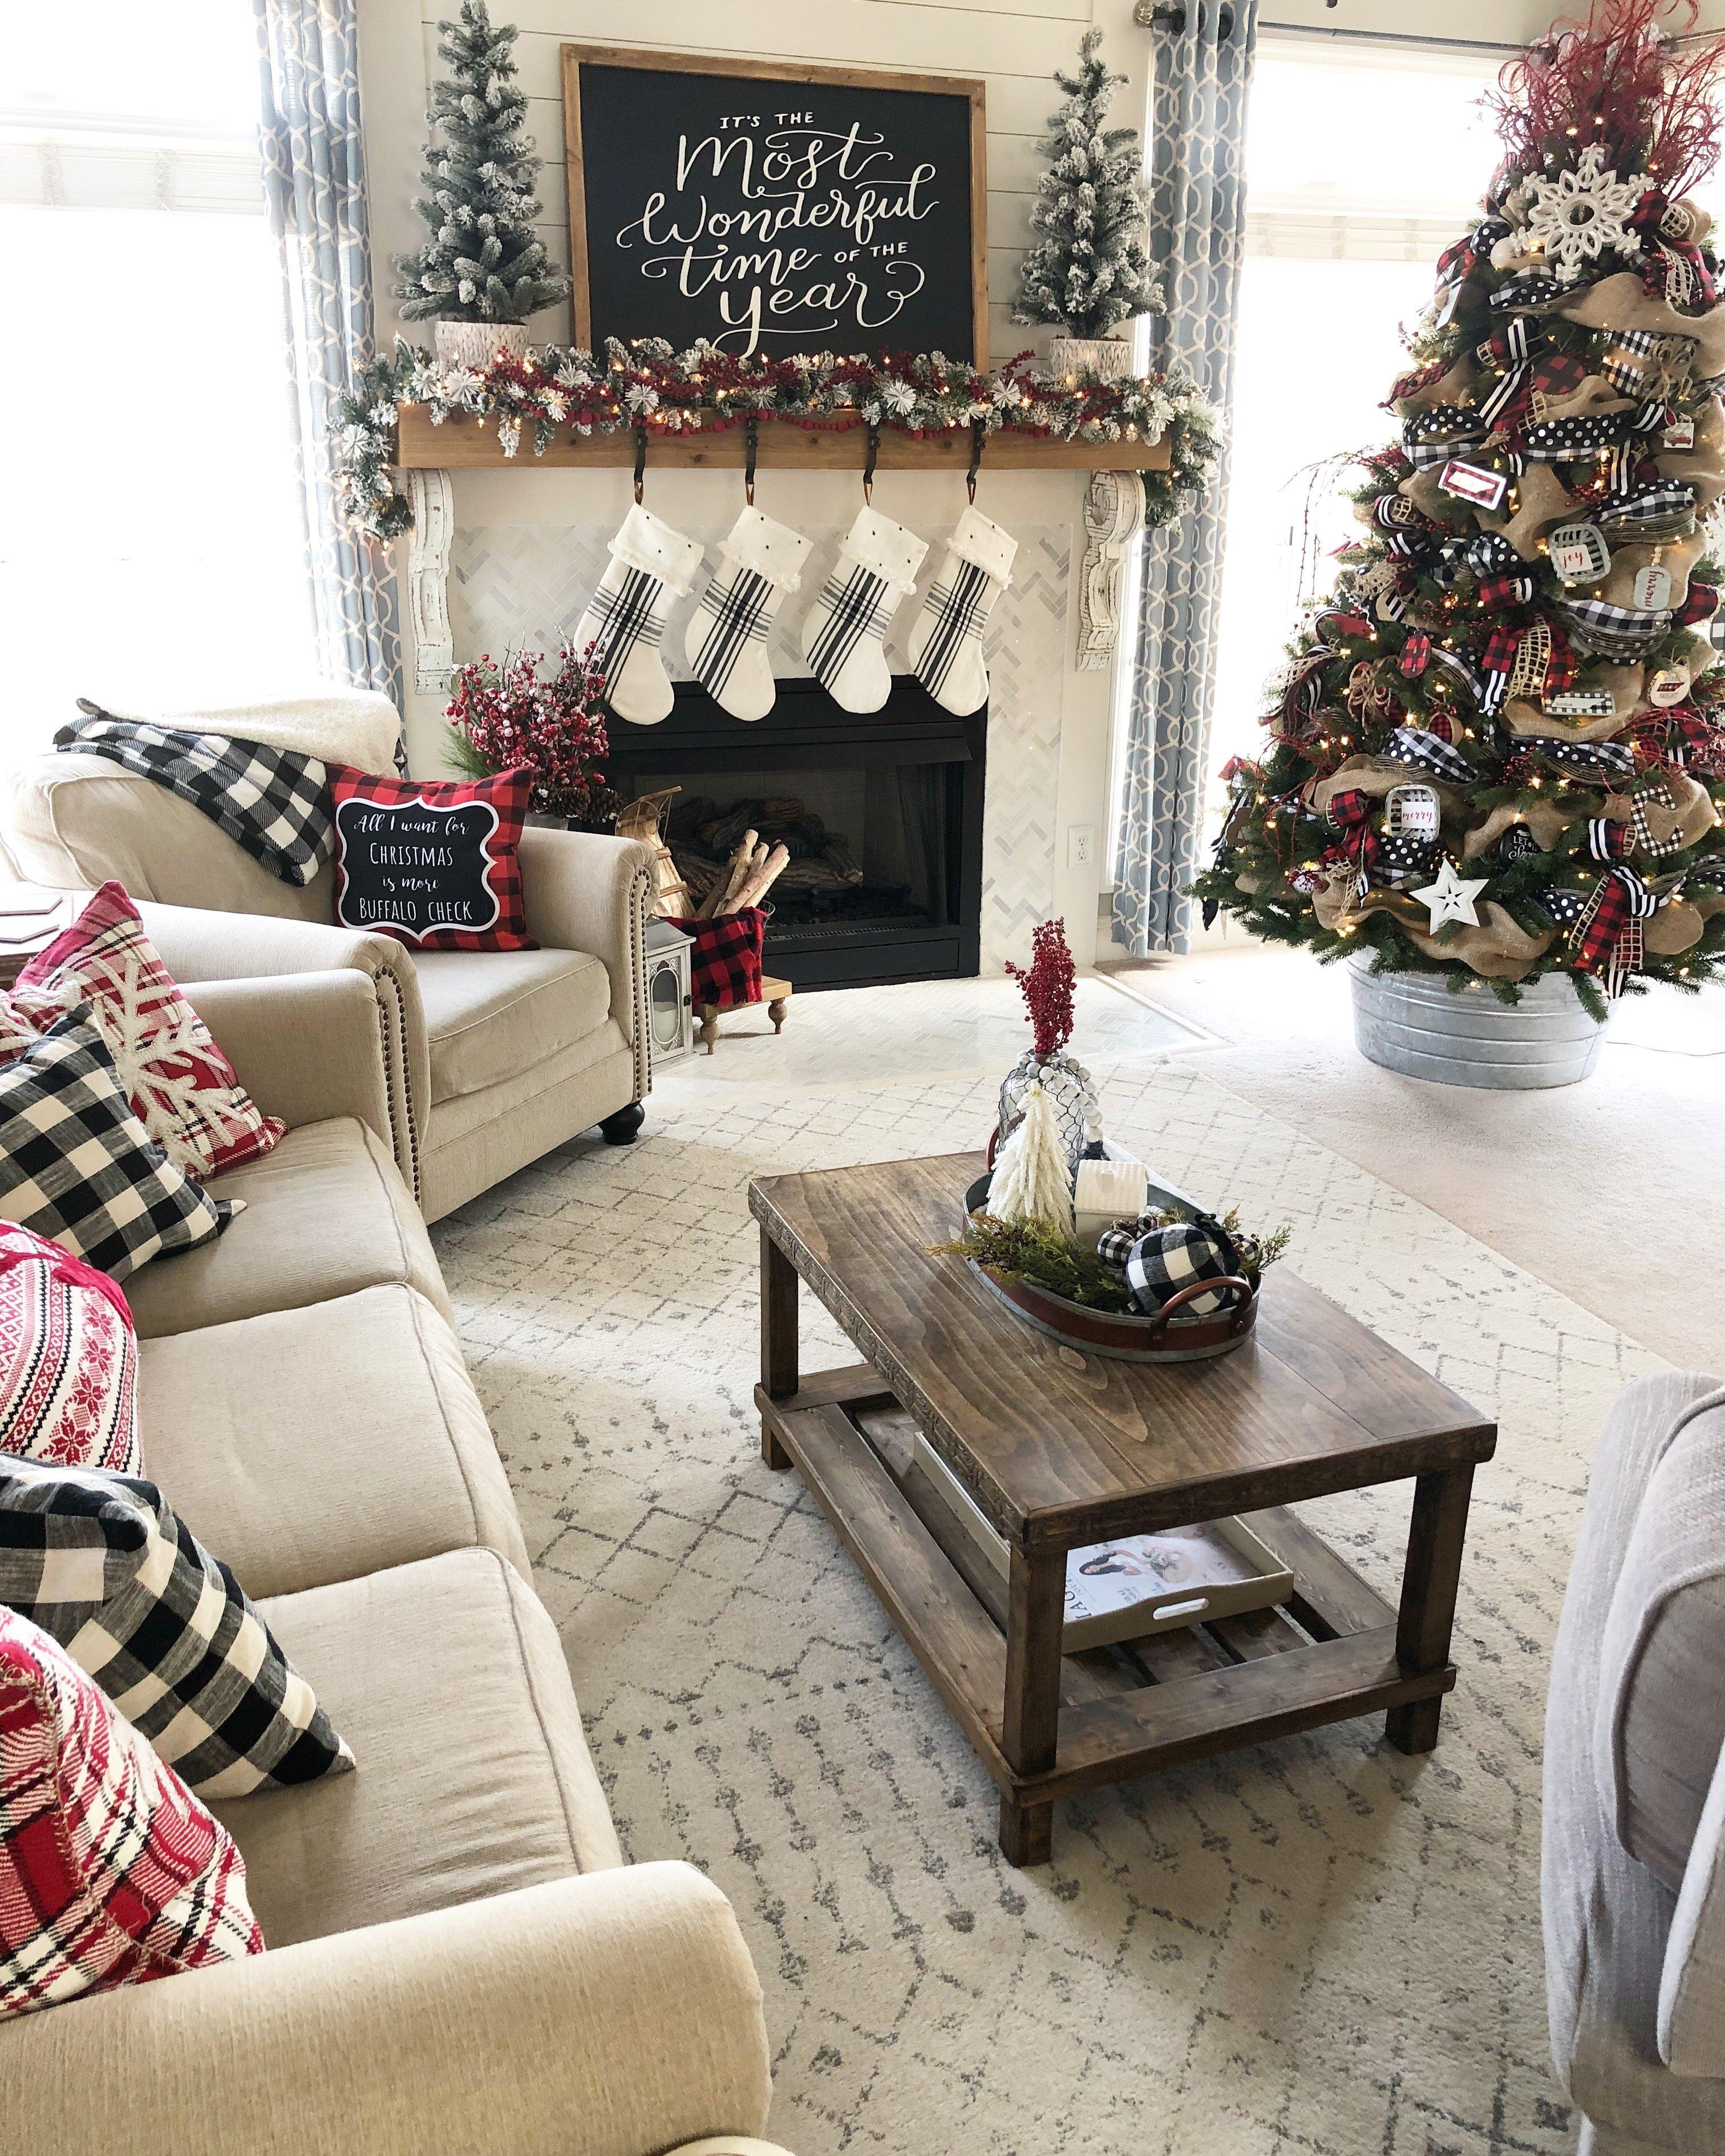 Christmas home tour buffalo check and plaid living room with tree with ribbon